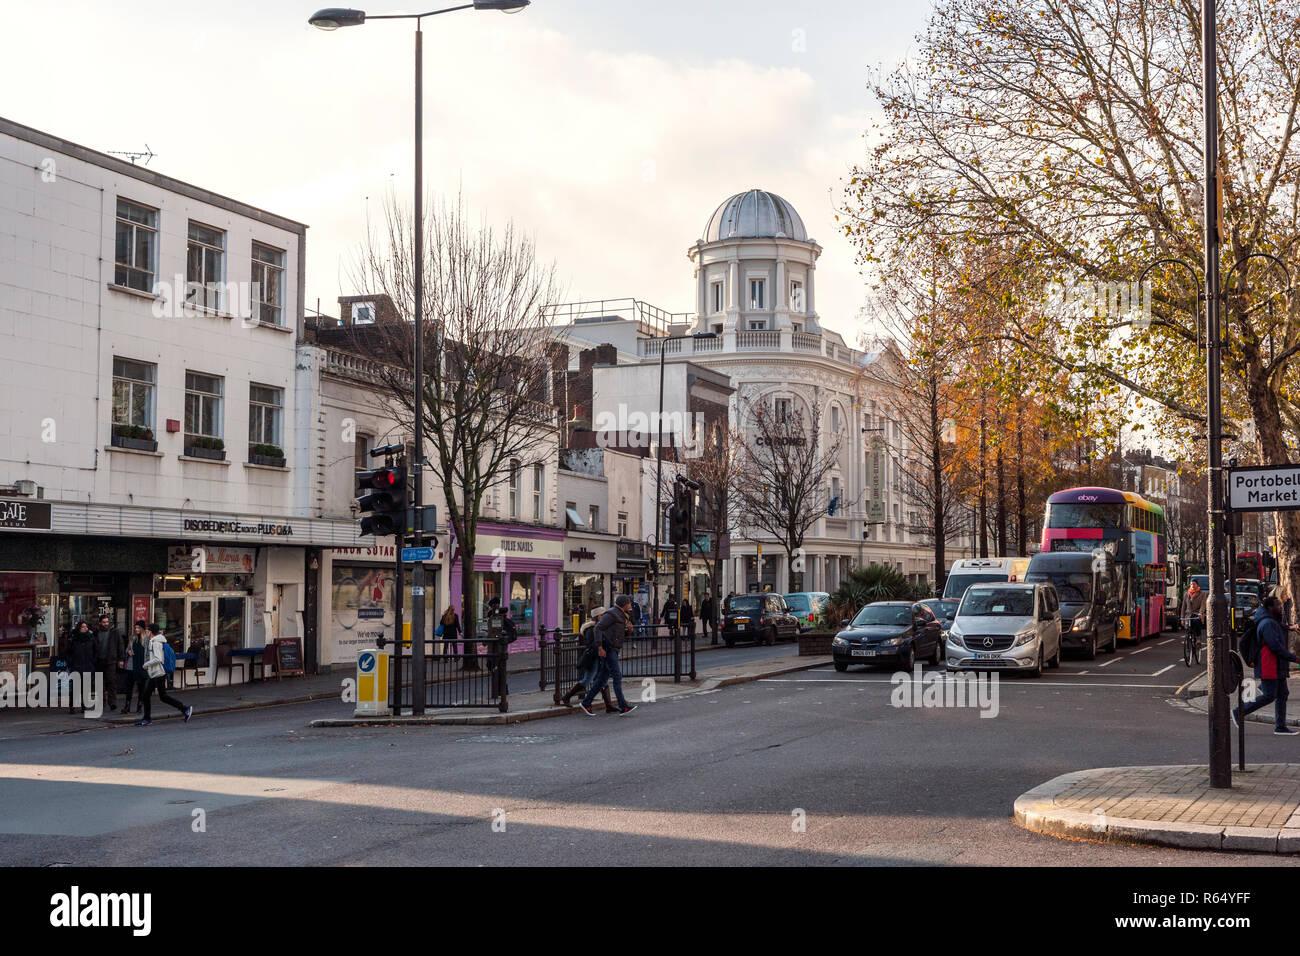 Notting Hill Gate, London - Stock Image